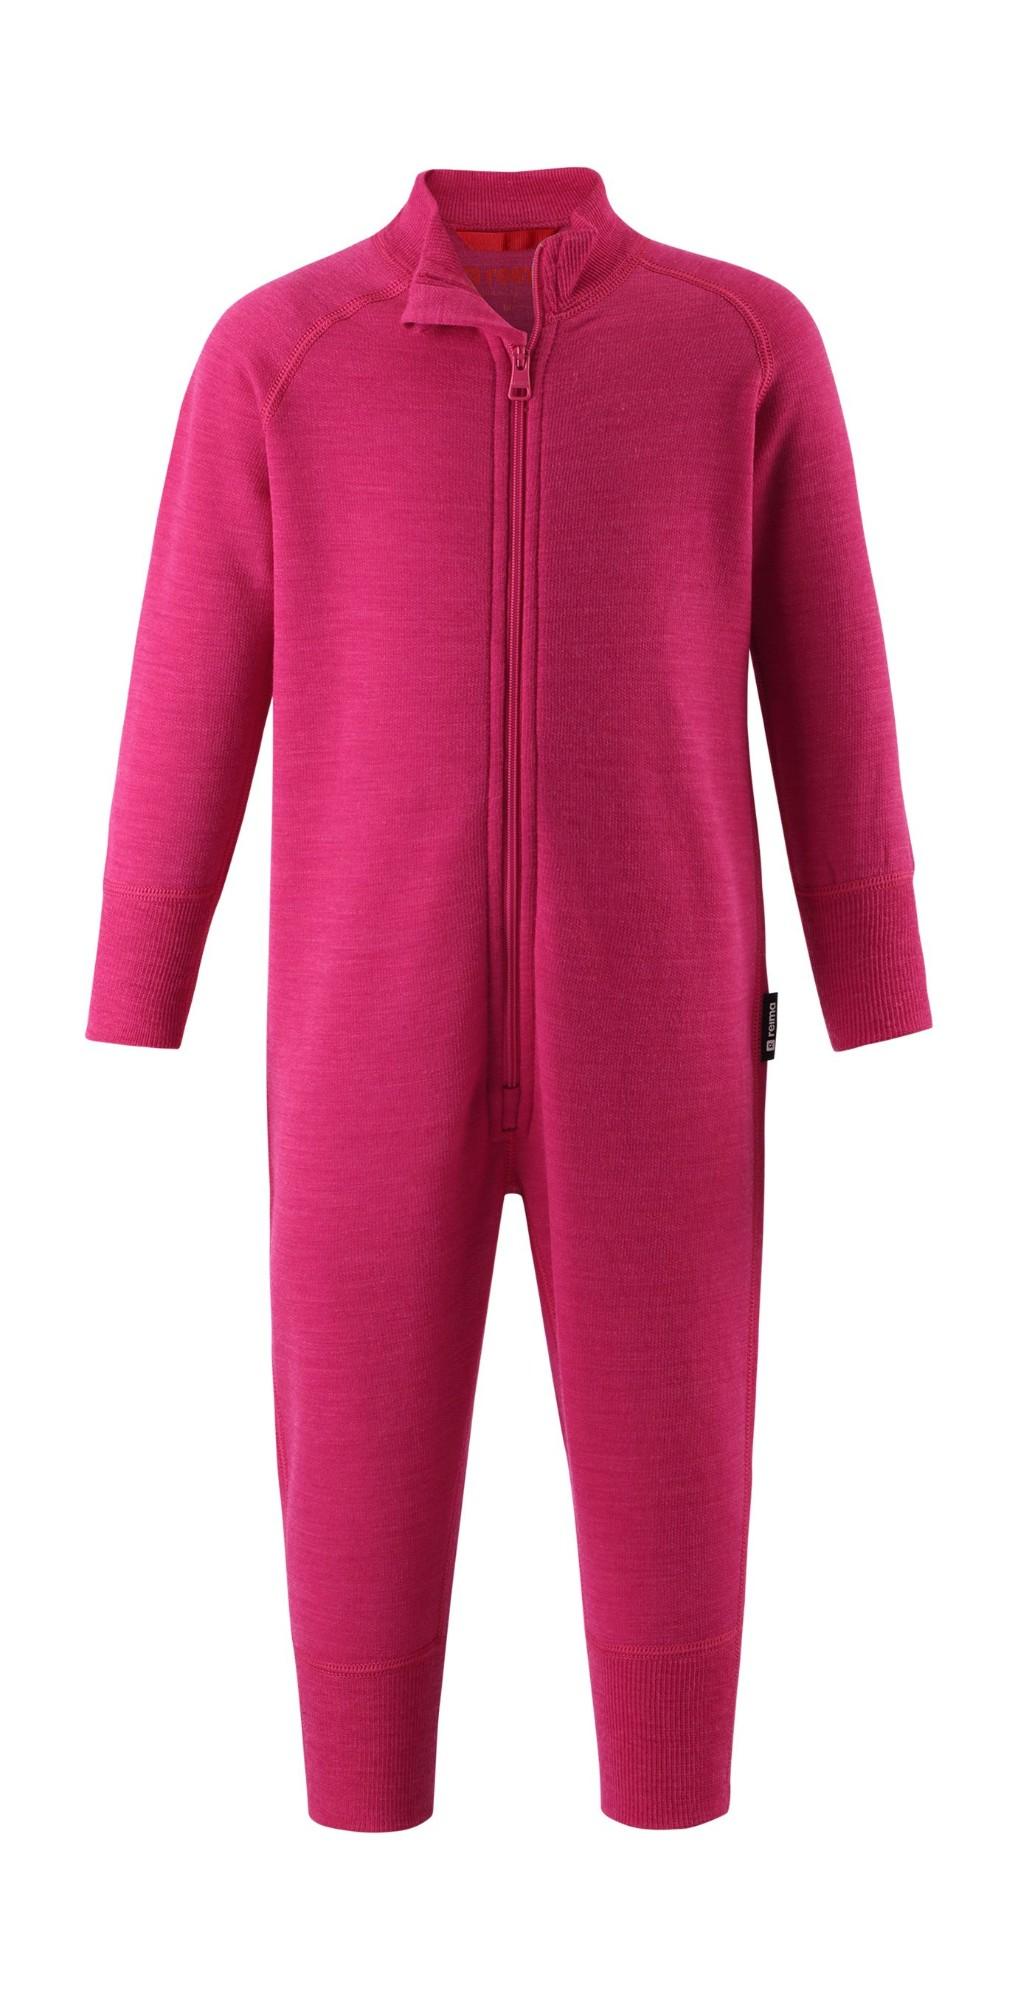 REIMA Parvin Raspberry Pink 98